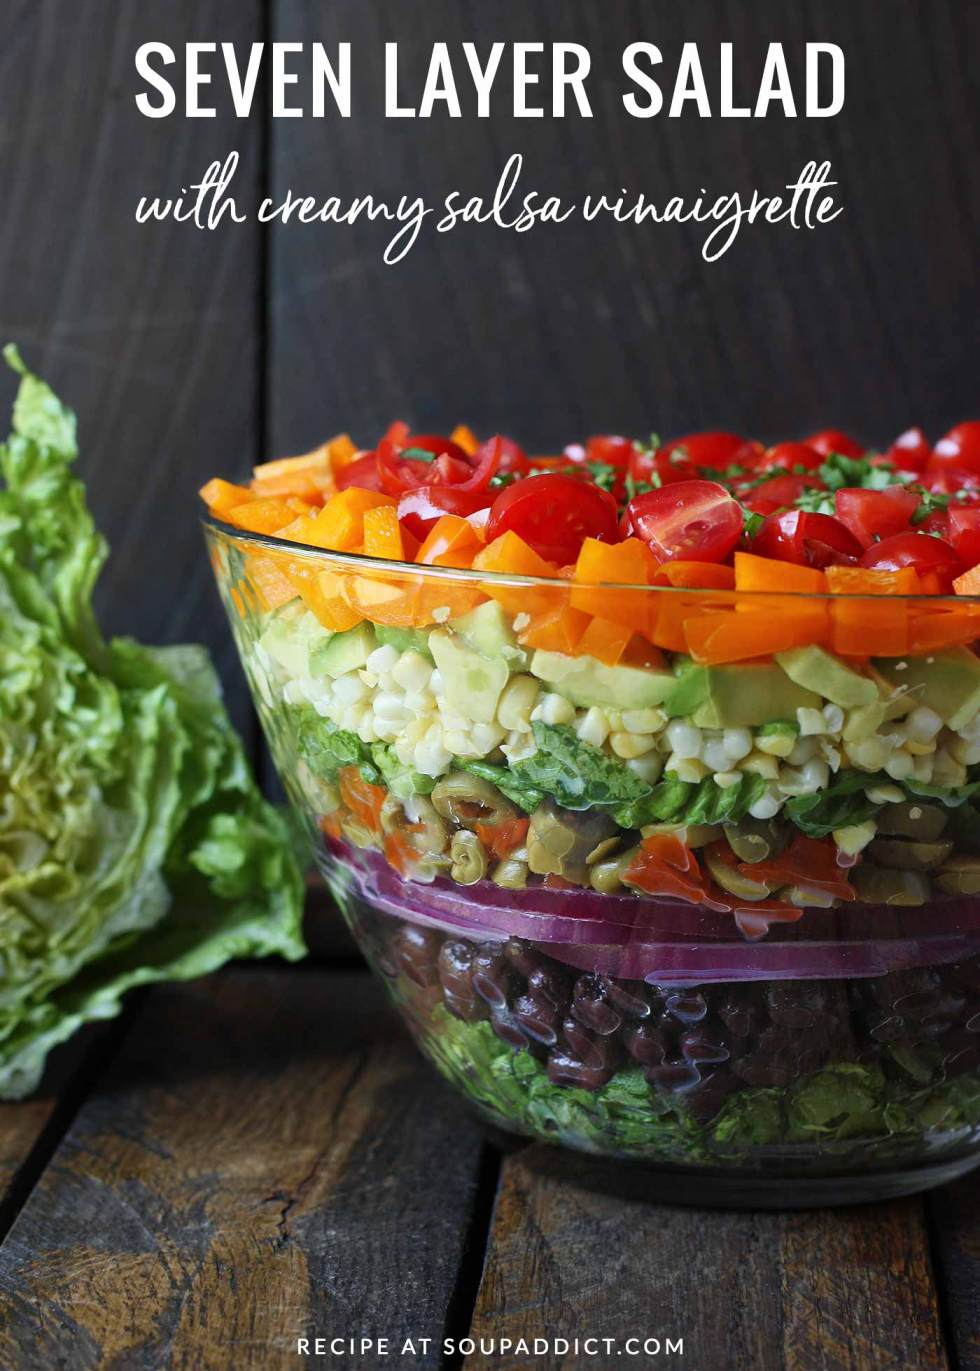 Seven Layer Salad Pinterest Pin - Recipe at SoupAddict.com